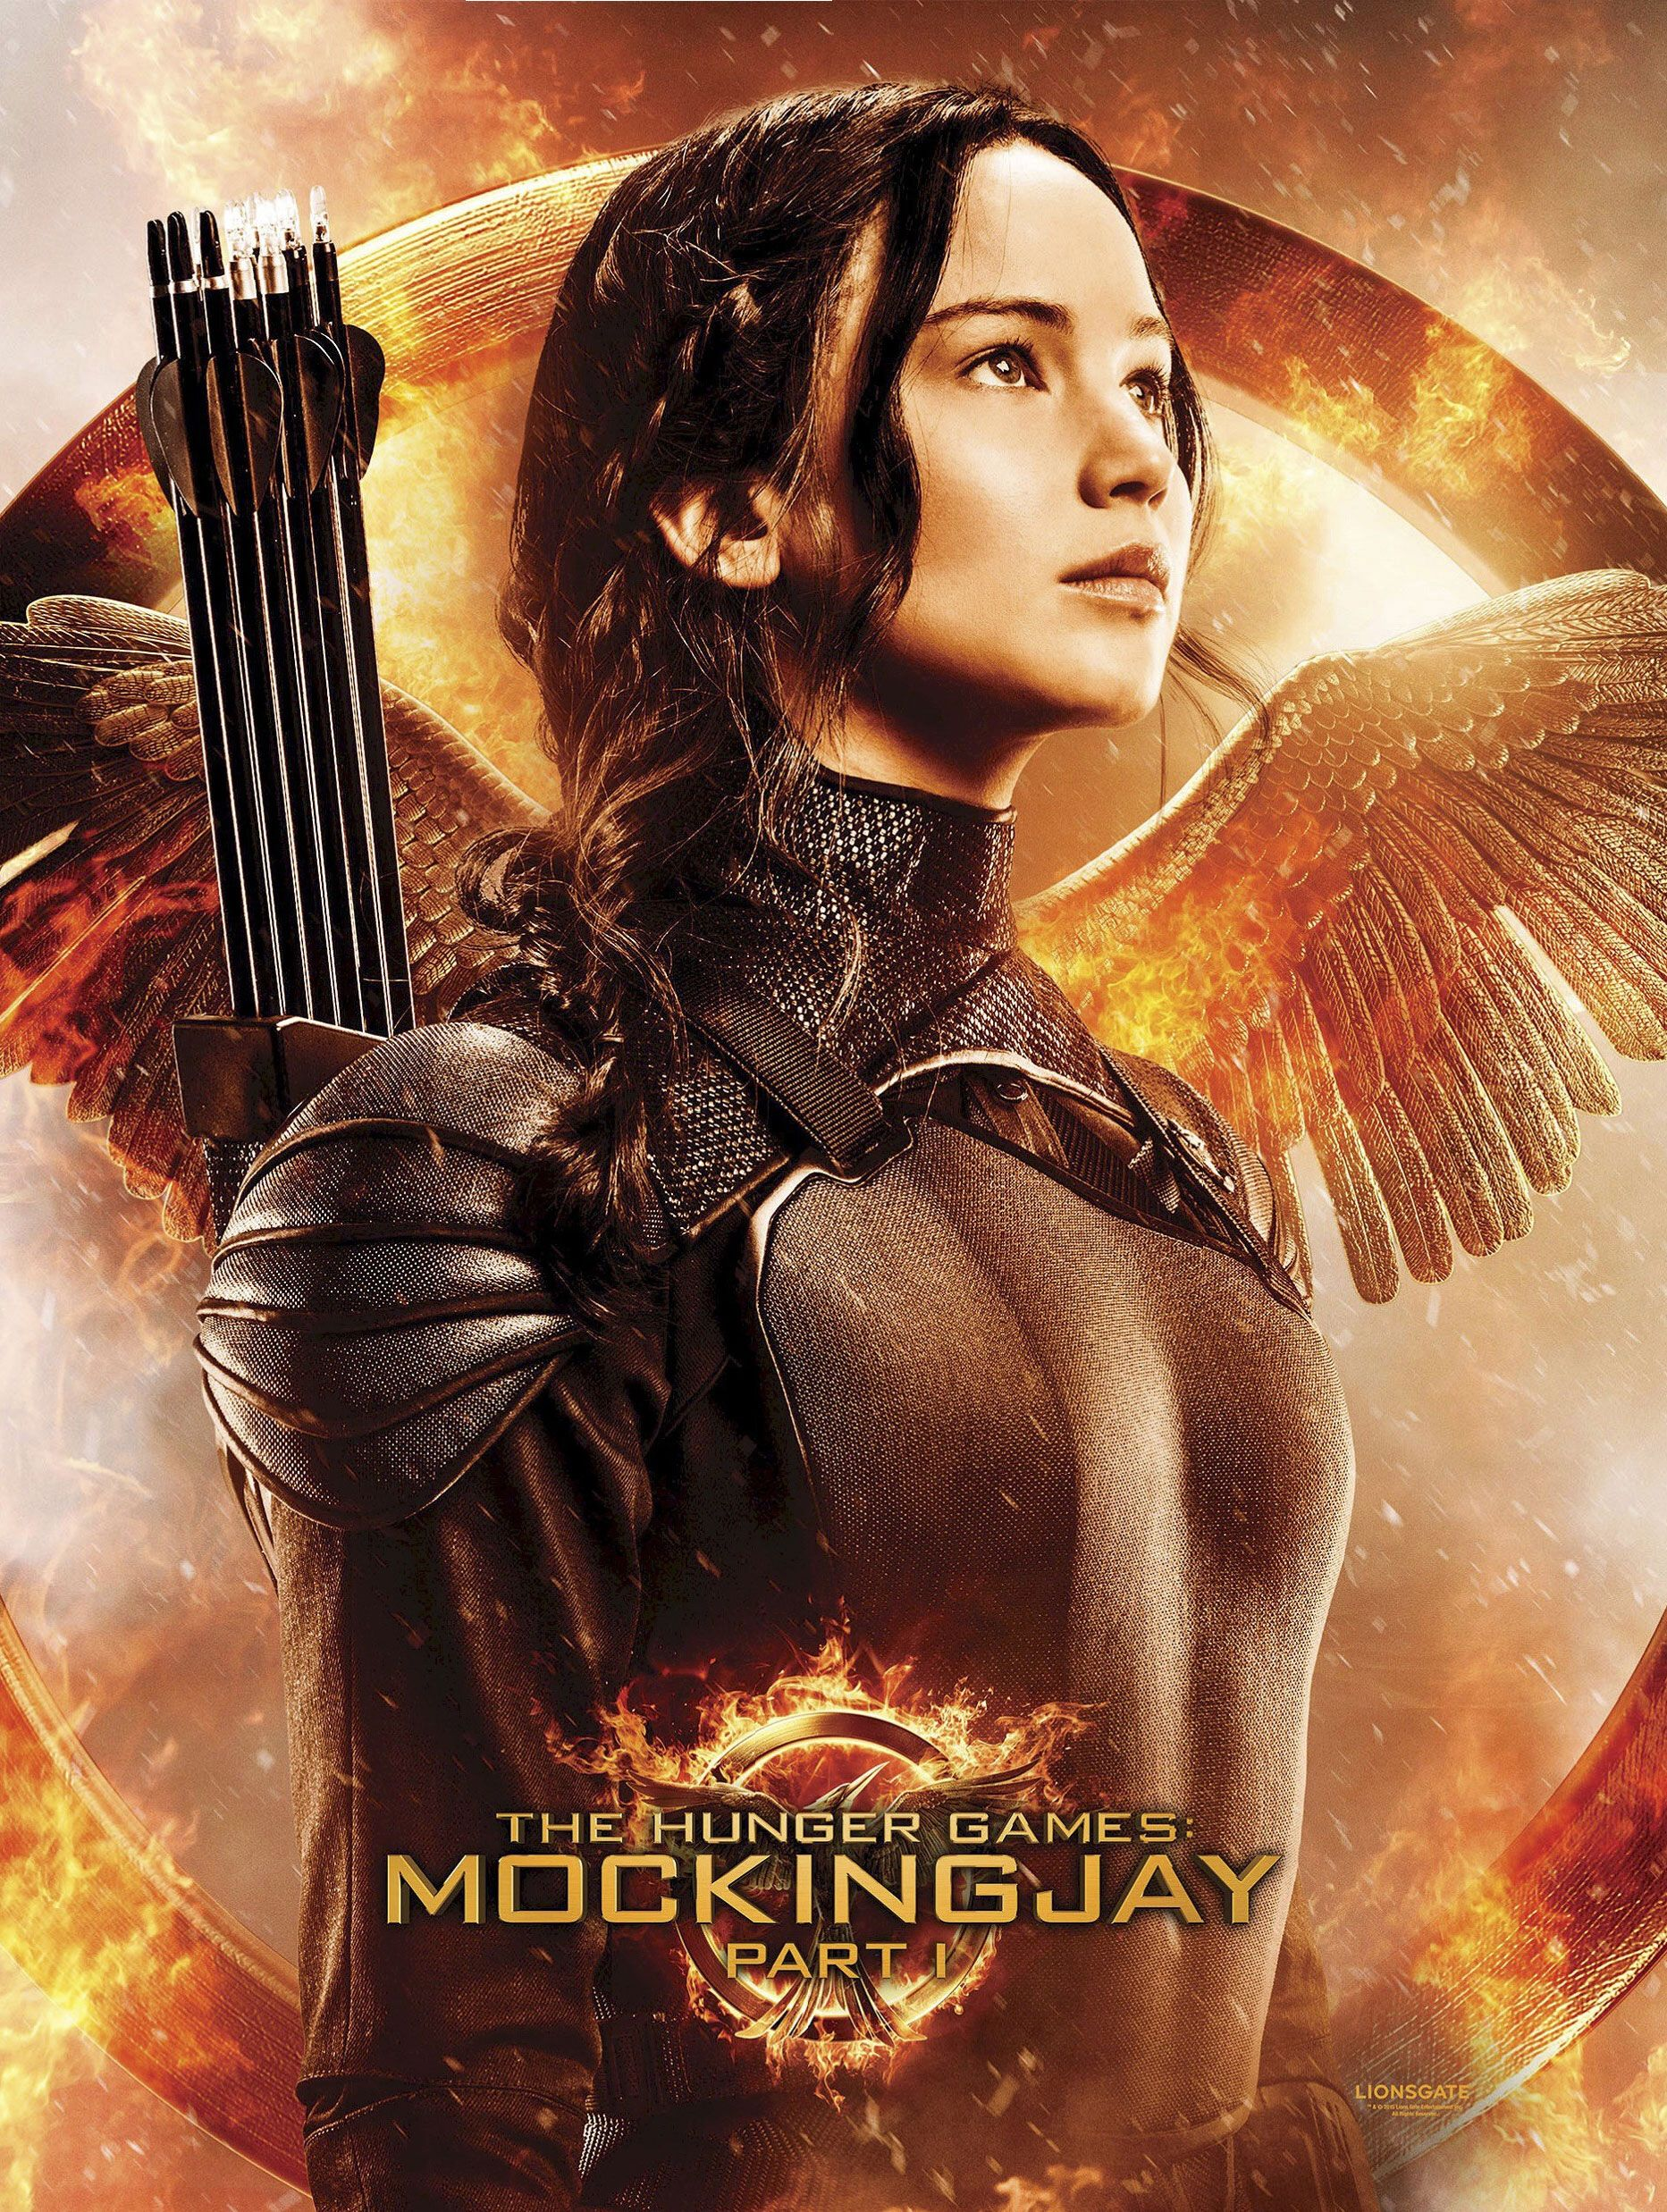 Image from https://thesefantasticworlds.files.wordpress.com/2015/01/hunger-games-mockinjay-target-movie-poster.jpg.